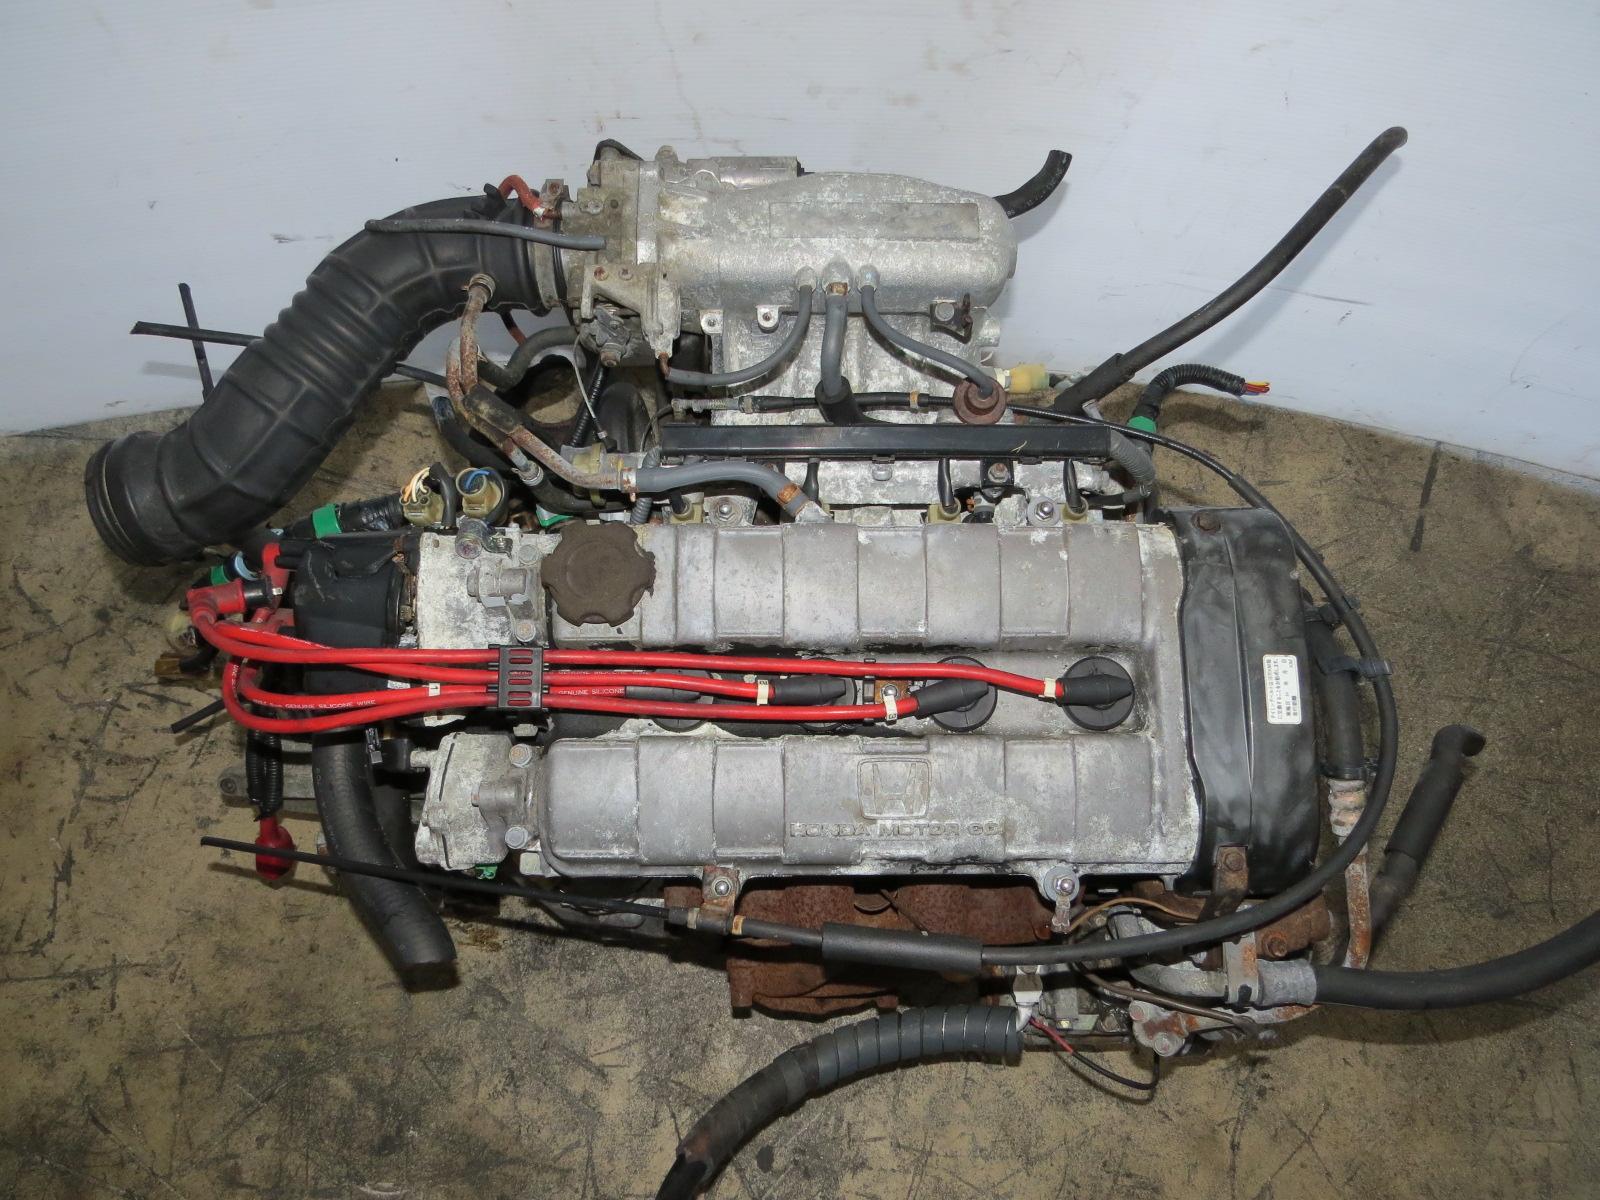 JDM 89-91 HONDA CIVIC ZC DOHC ENGINE & LSD MANUAL TRANSMISSION